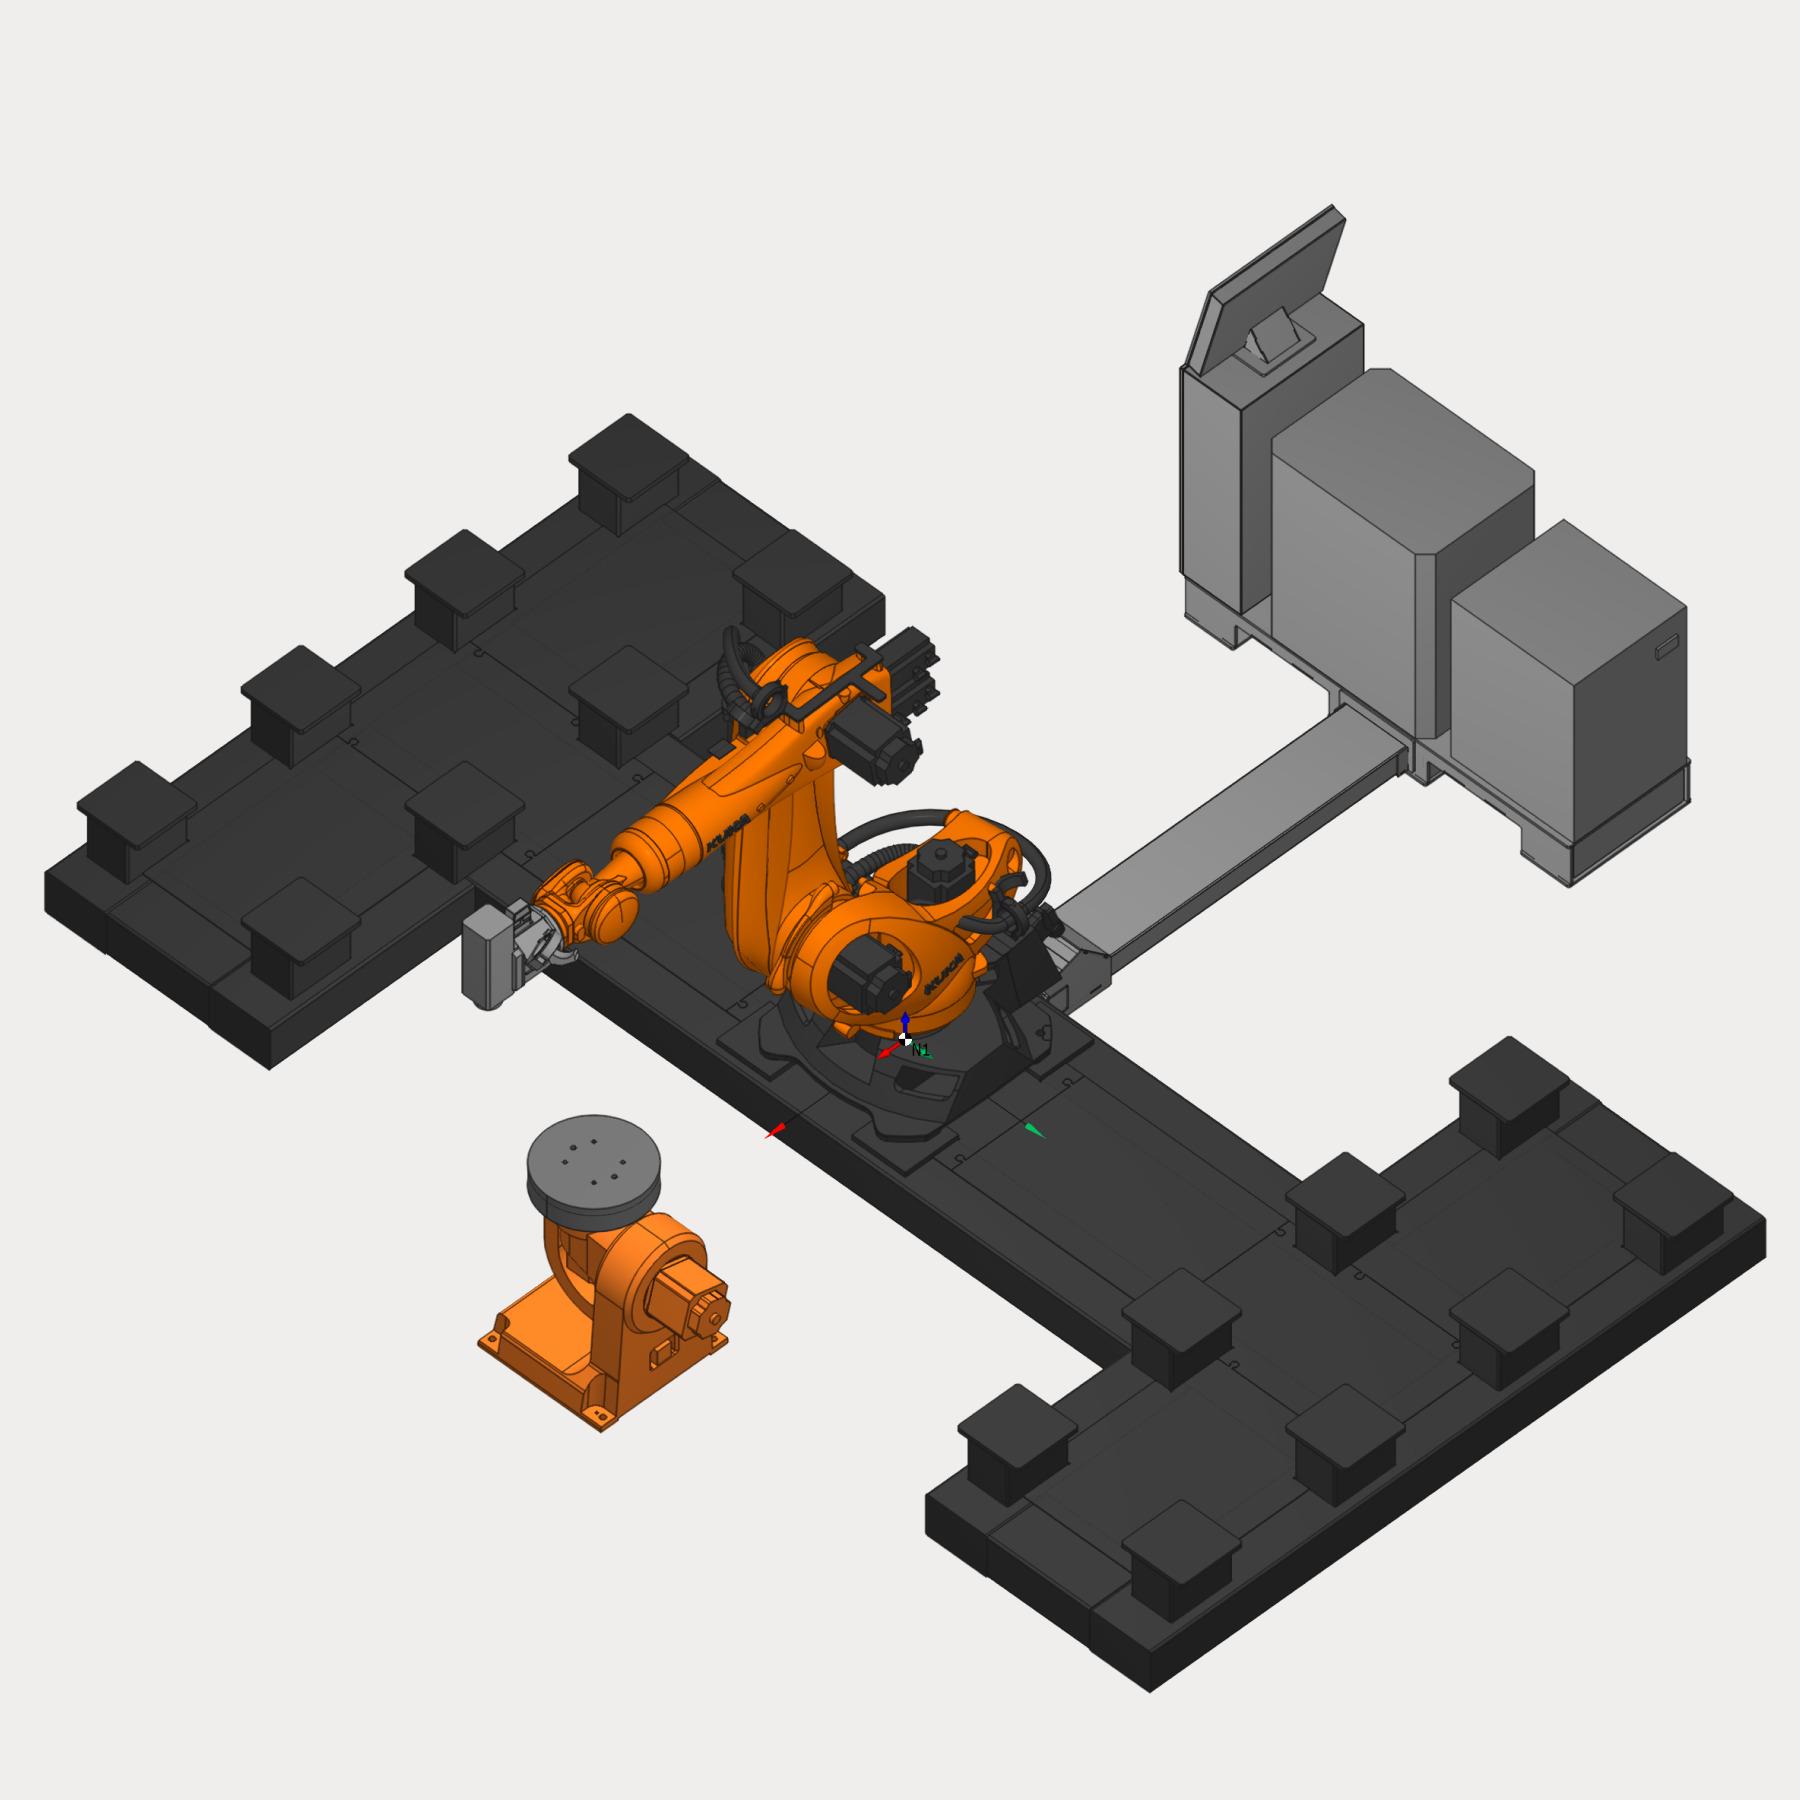 Robot cell